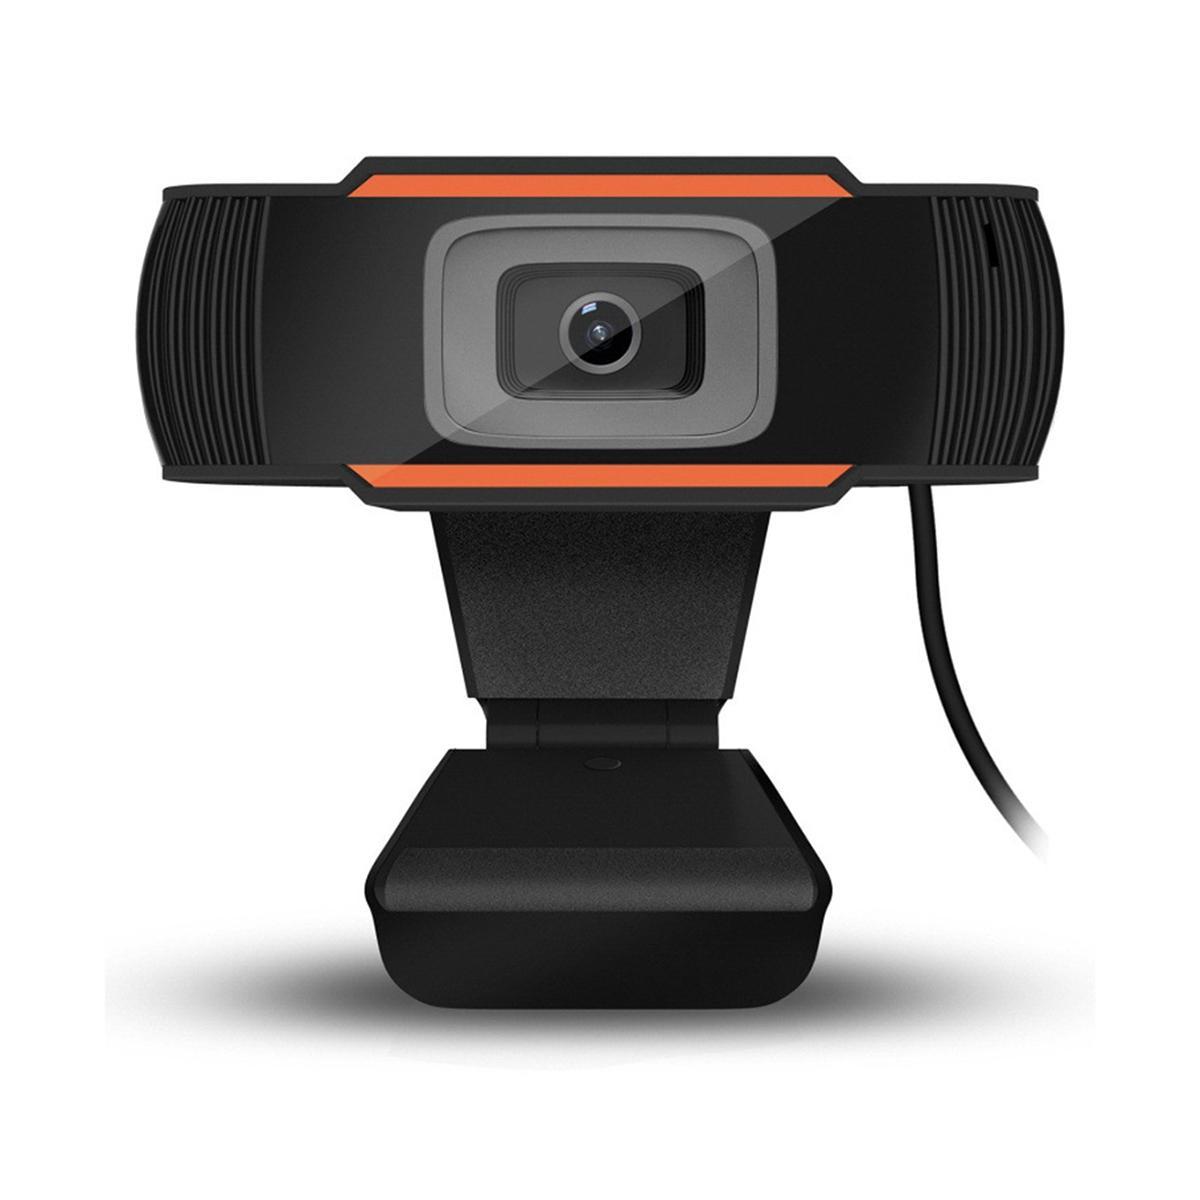 Webcam 1080P HD Web Camera USB Webcam PC Camera Plug Play Camera Autofocus with Microphone for Computers Laptop Webcam 4k web ca 5pcs ZY-SX